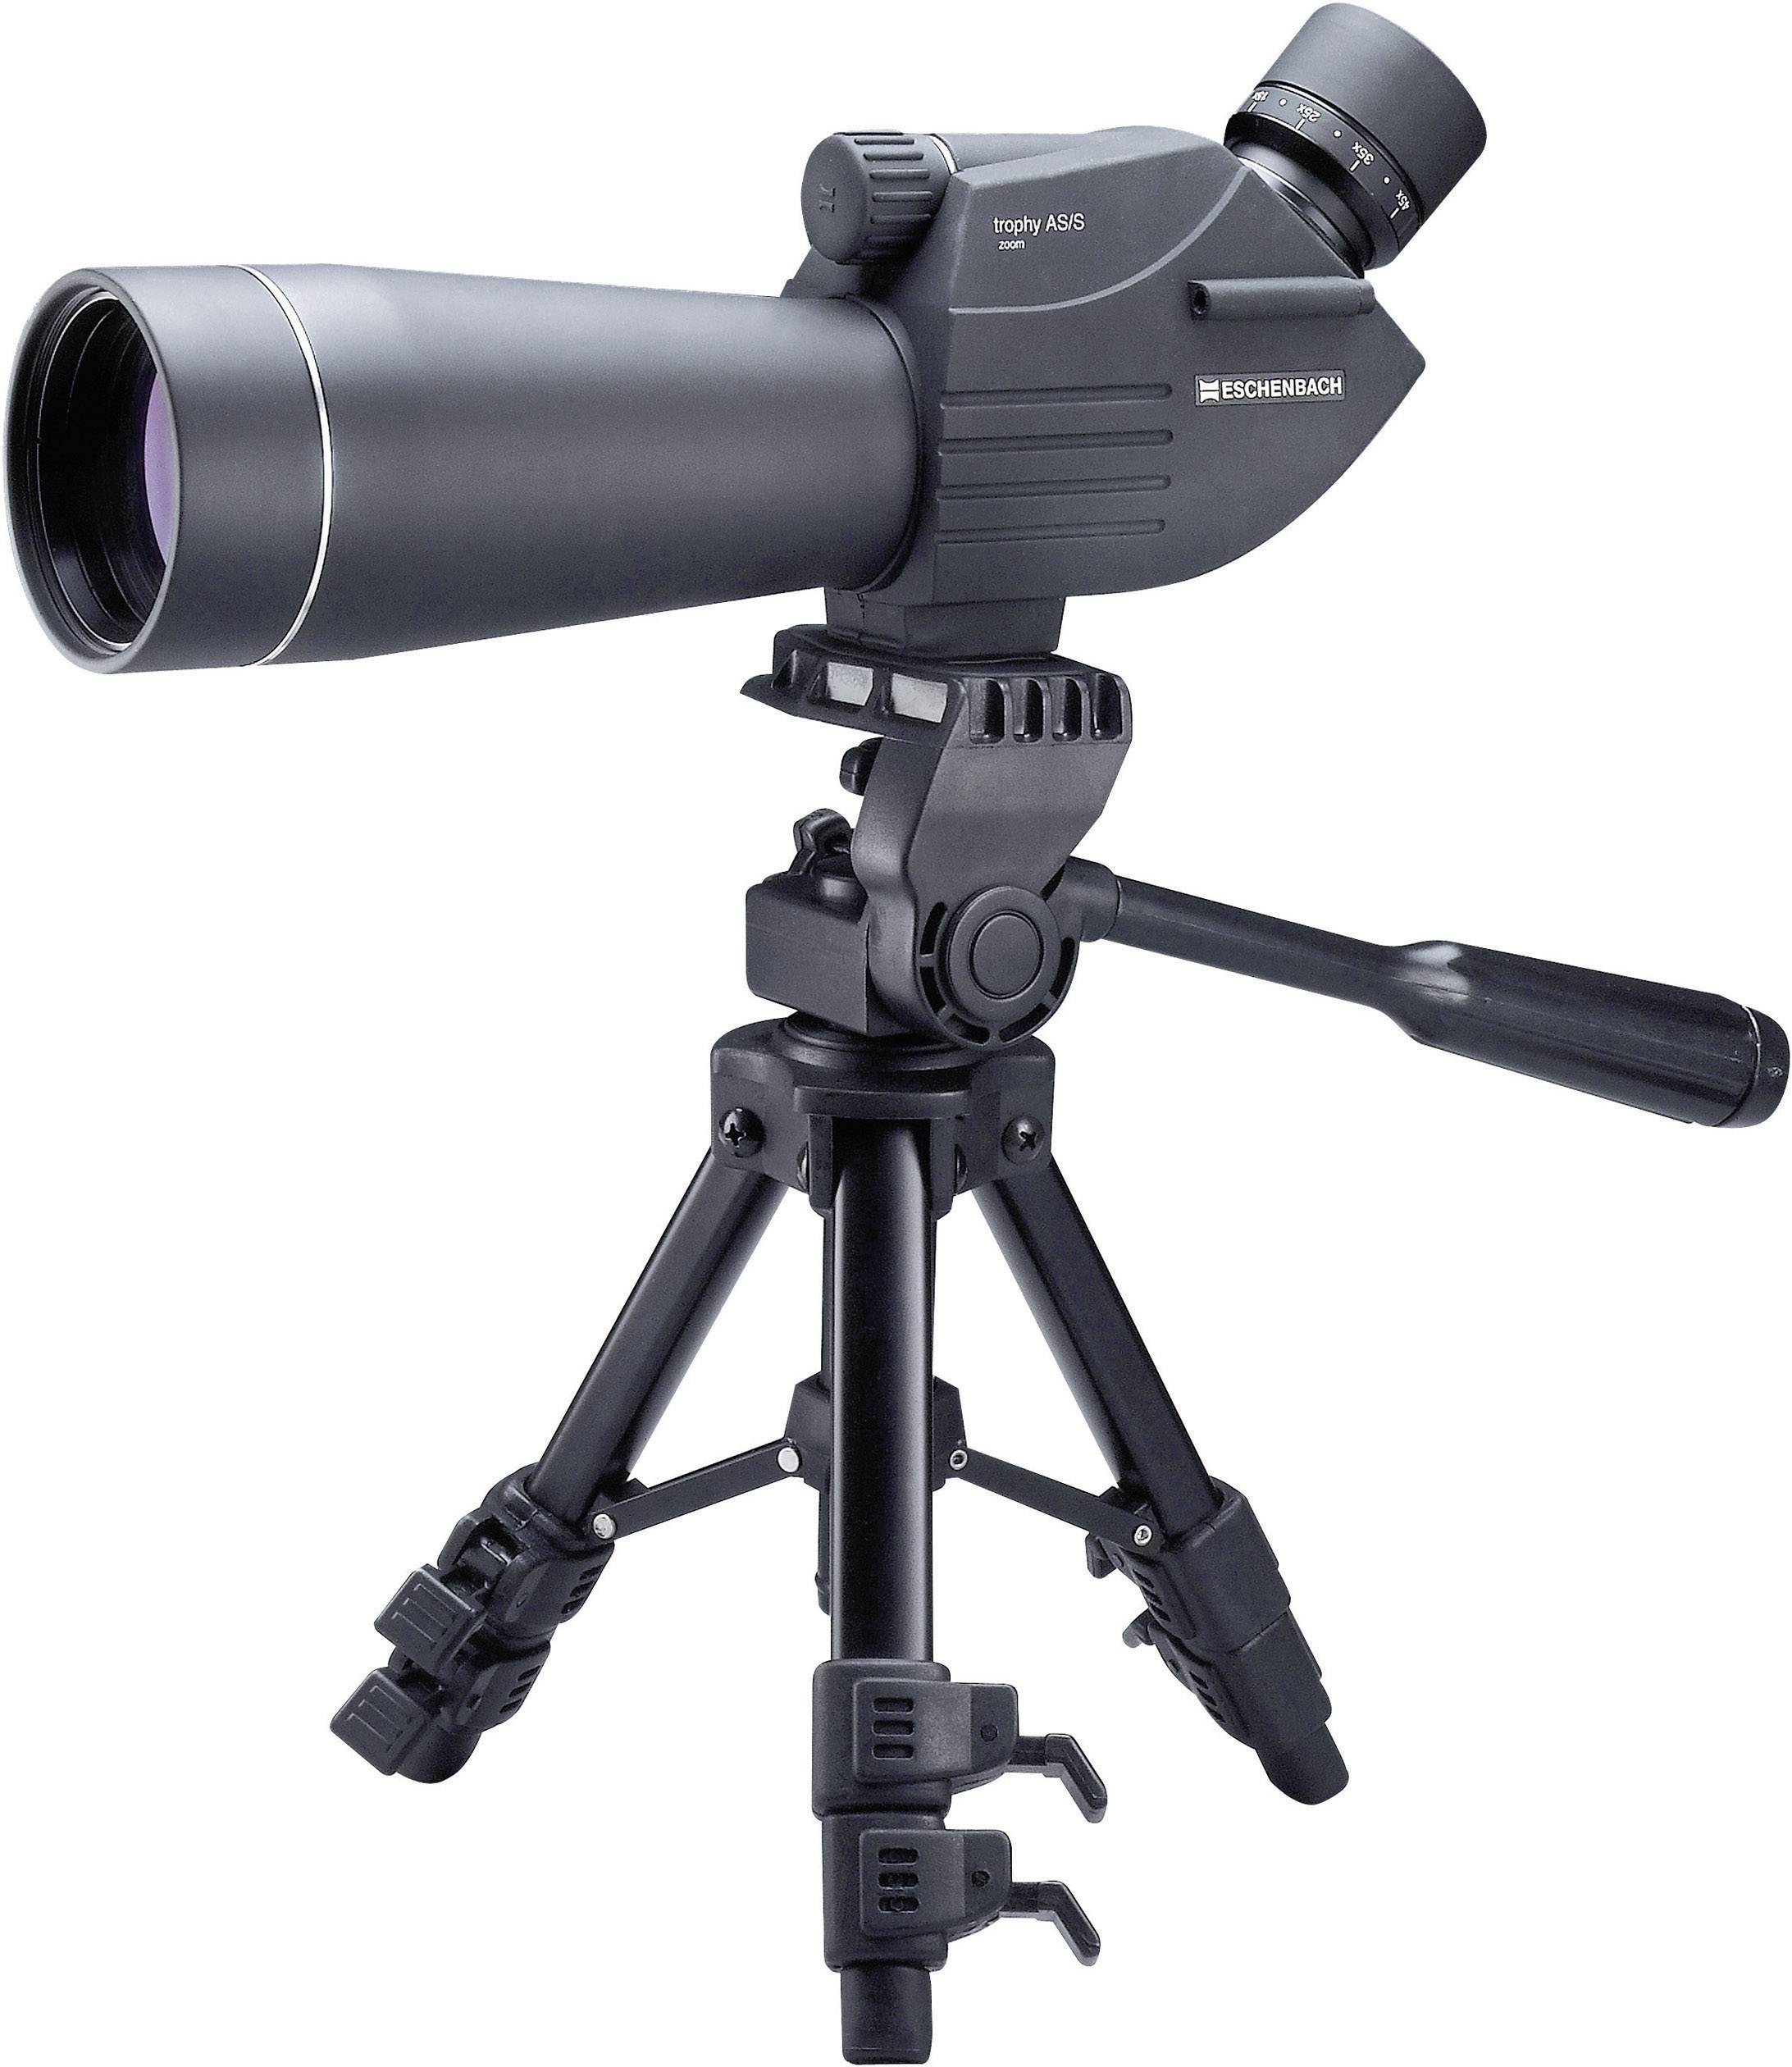 Spektiv Eschenbach Trophy 15-45x60 B 60 mm, šedá